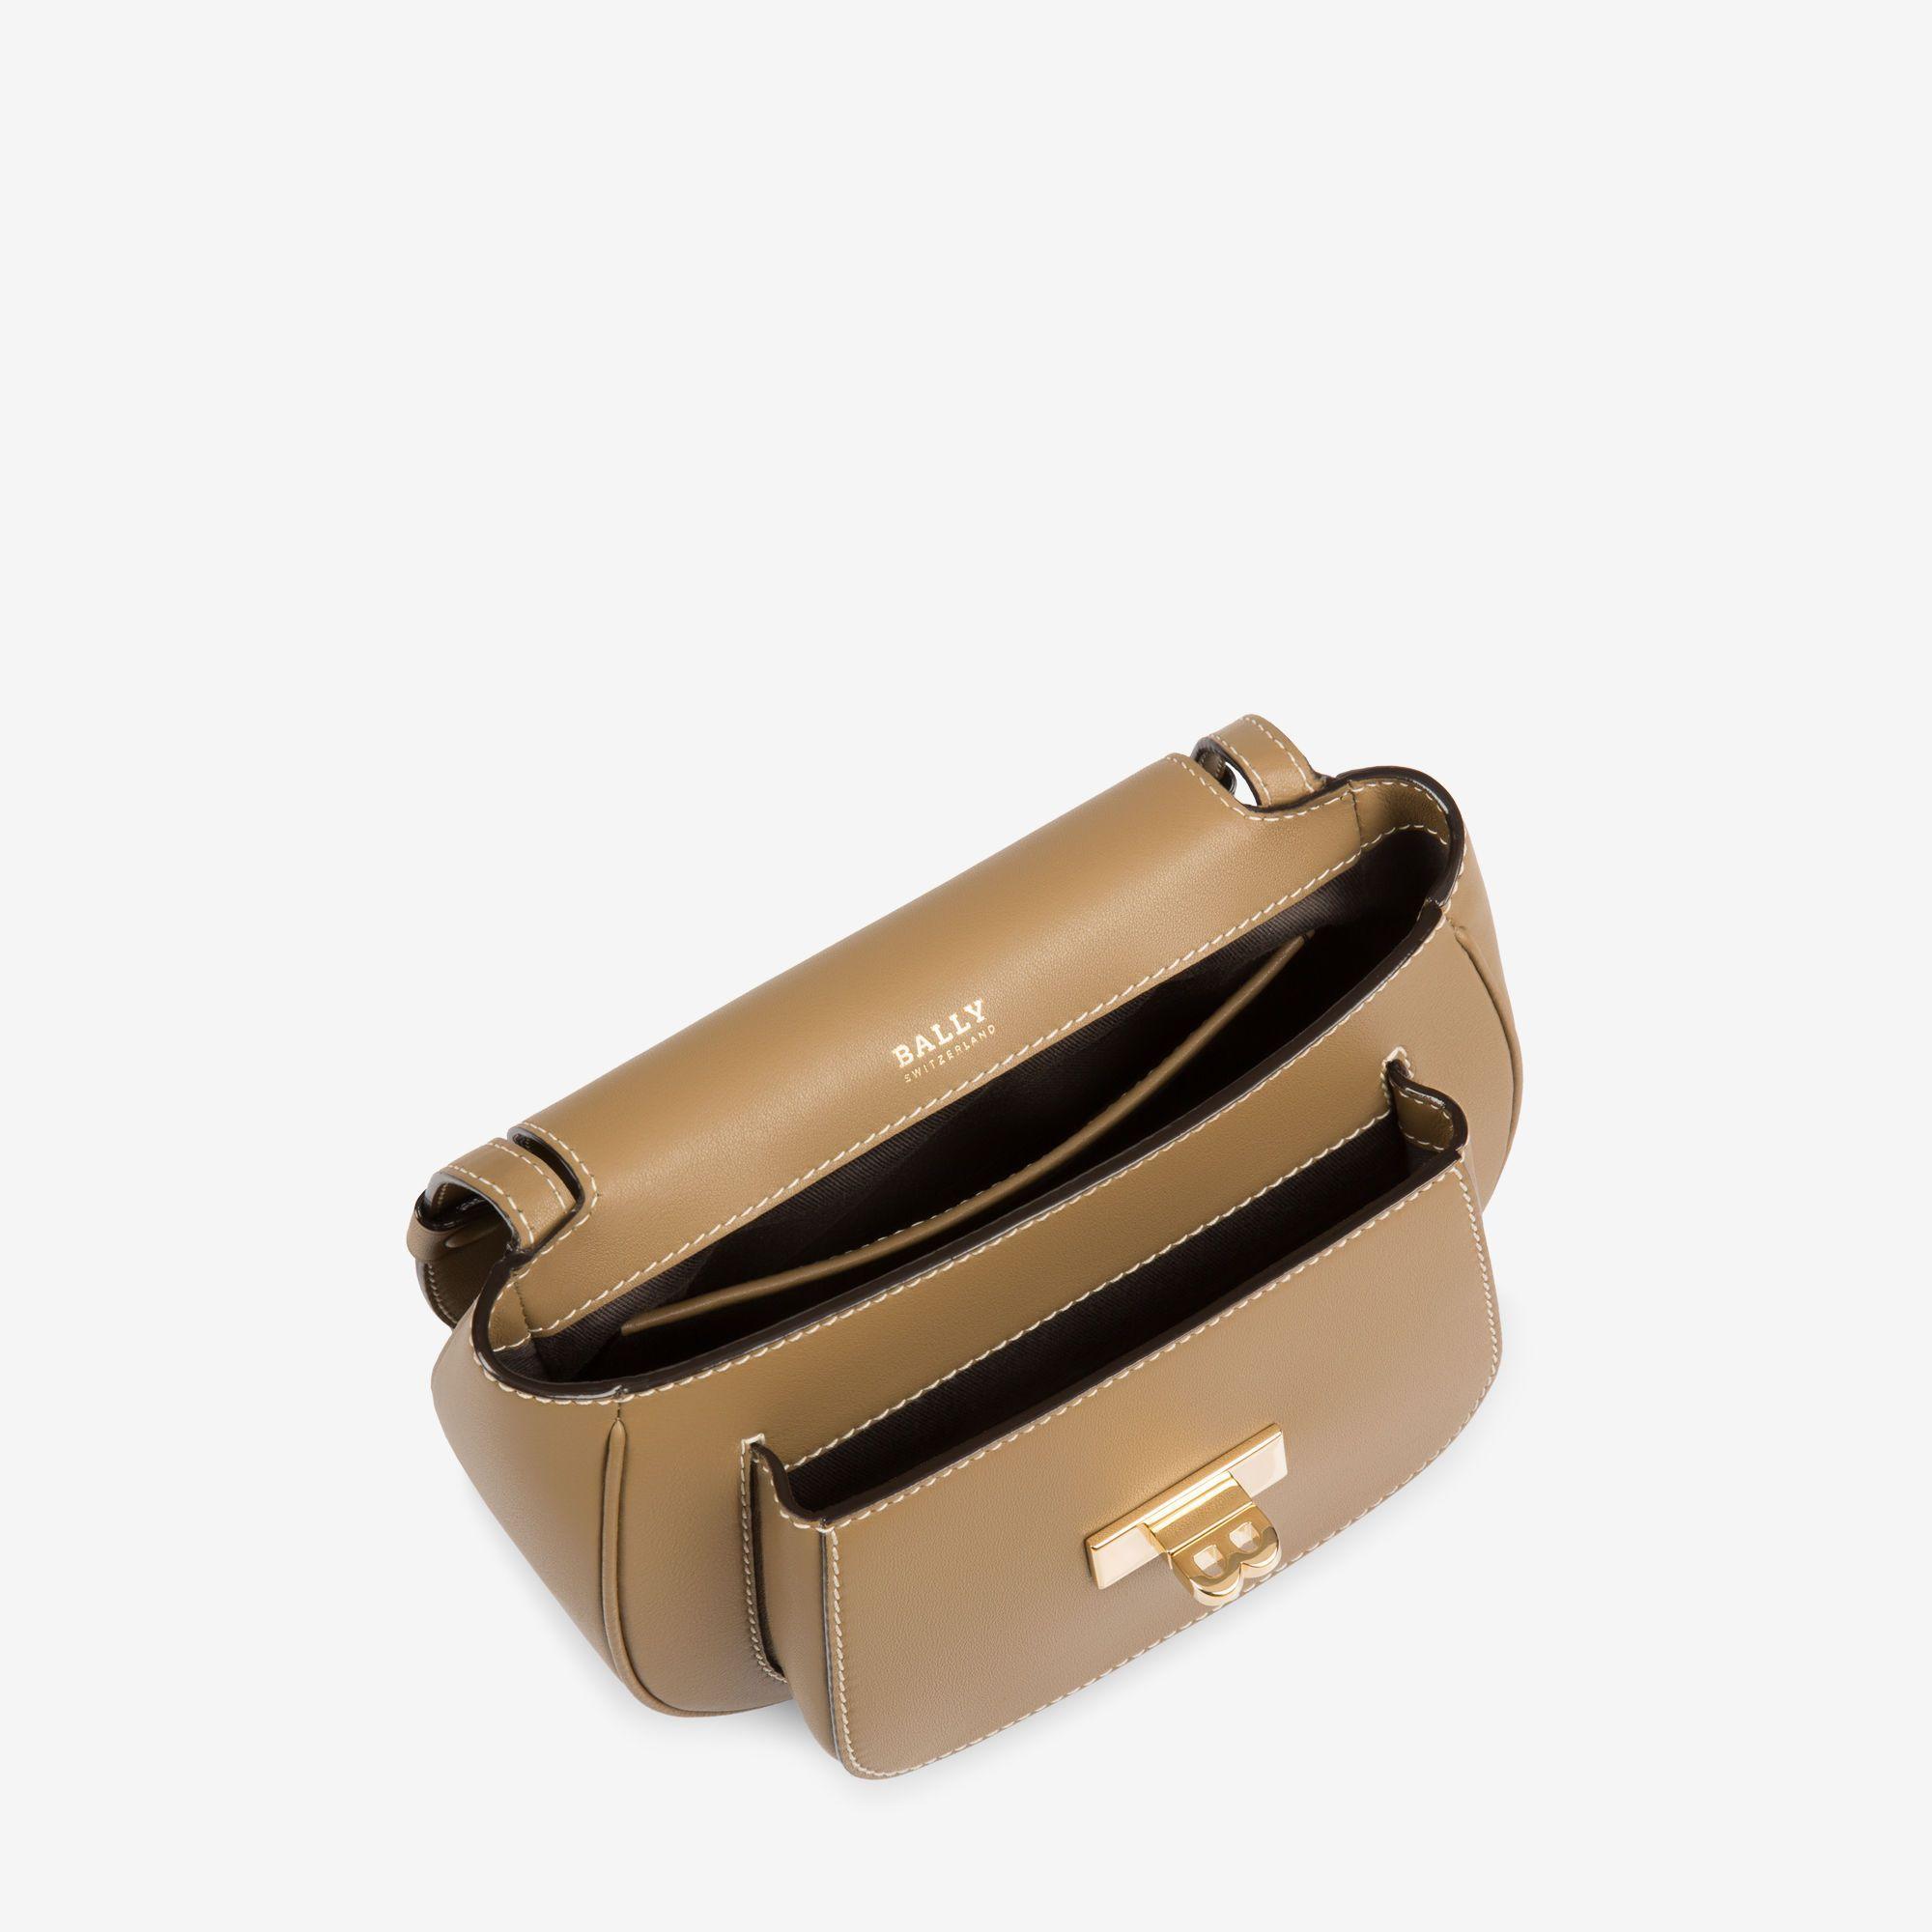 B TURN SADDLE BAG MEDIUM - BEIGE BOVINE Shoulder Bags   Womens ... c0164968e7